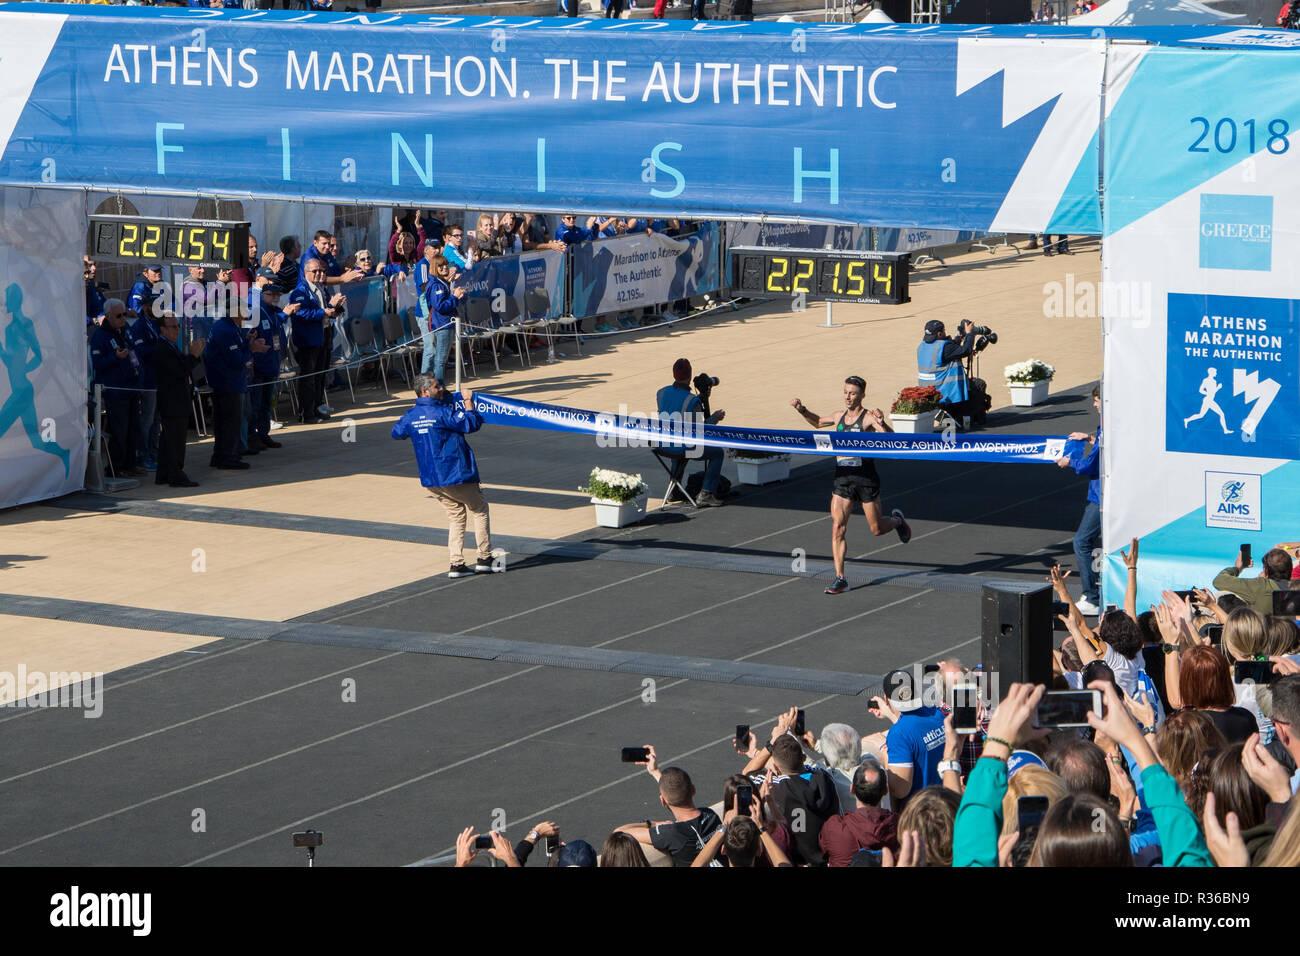 36th Athens Authentic Marathon. Konstantinos Gkelaouzos crossing 7th the finish line at Panathenaic stadium. 1st Greek champion. - Stock Image